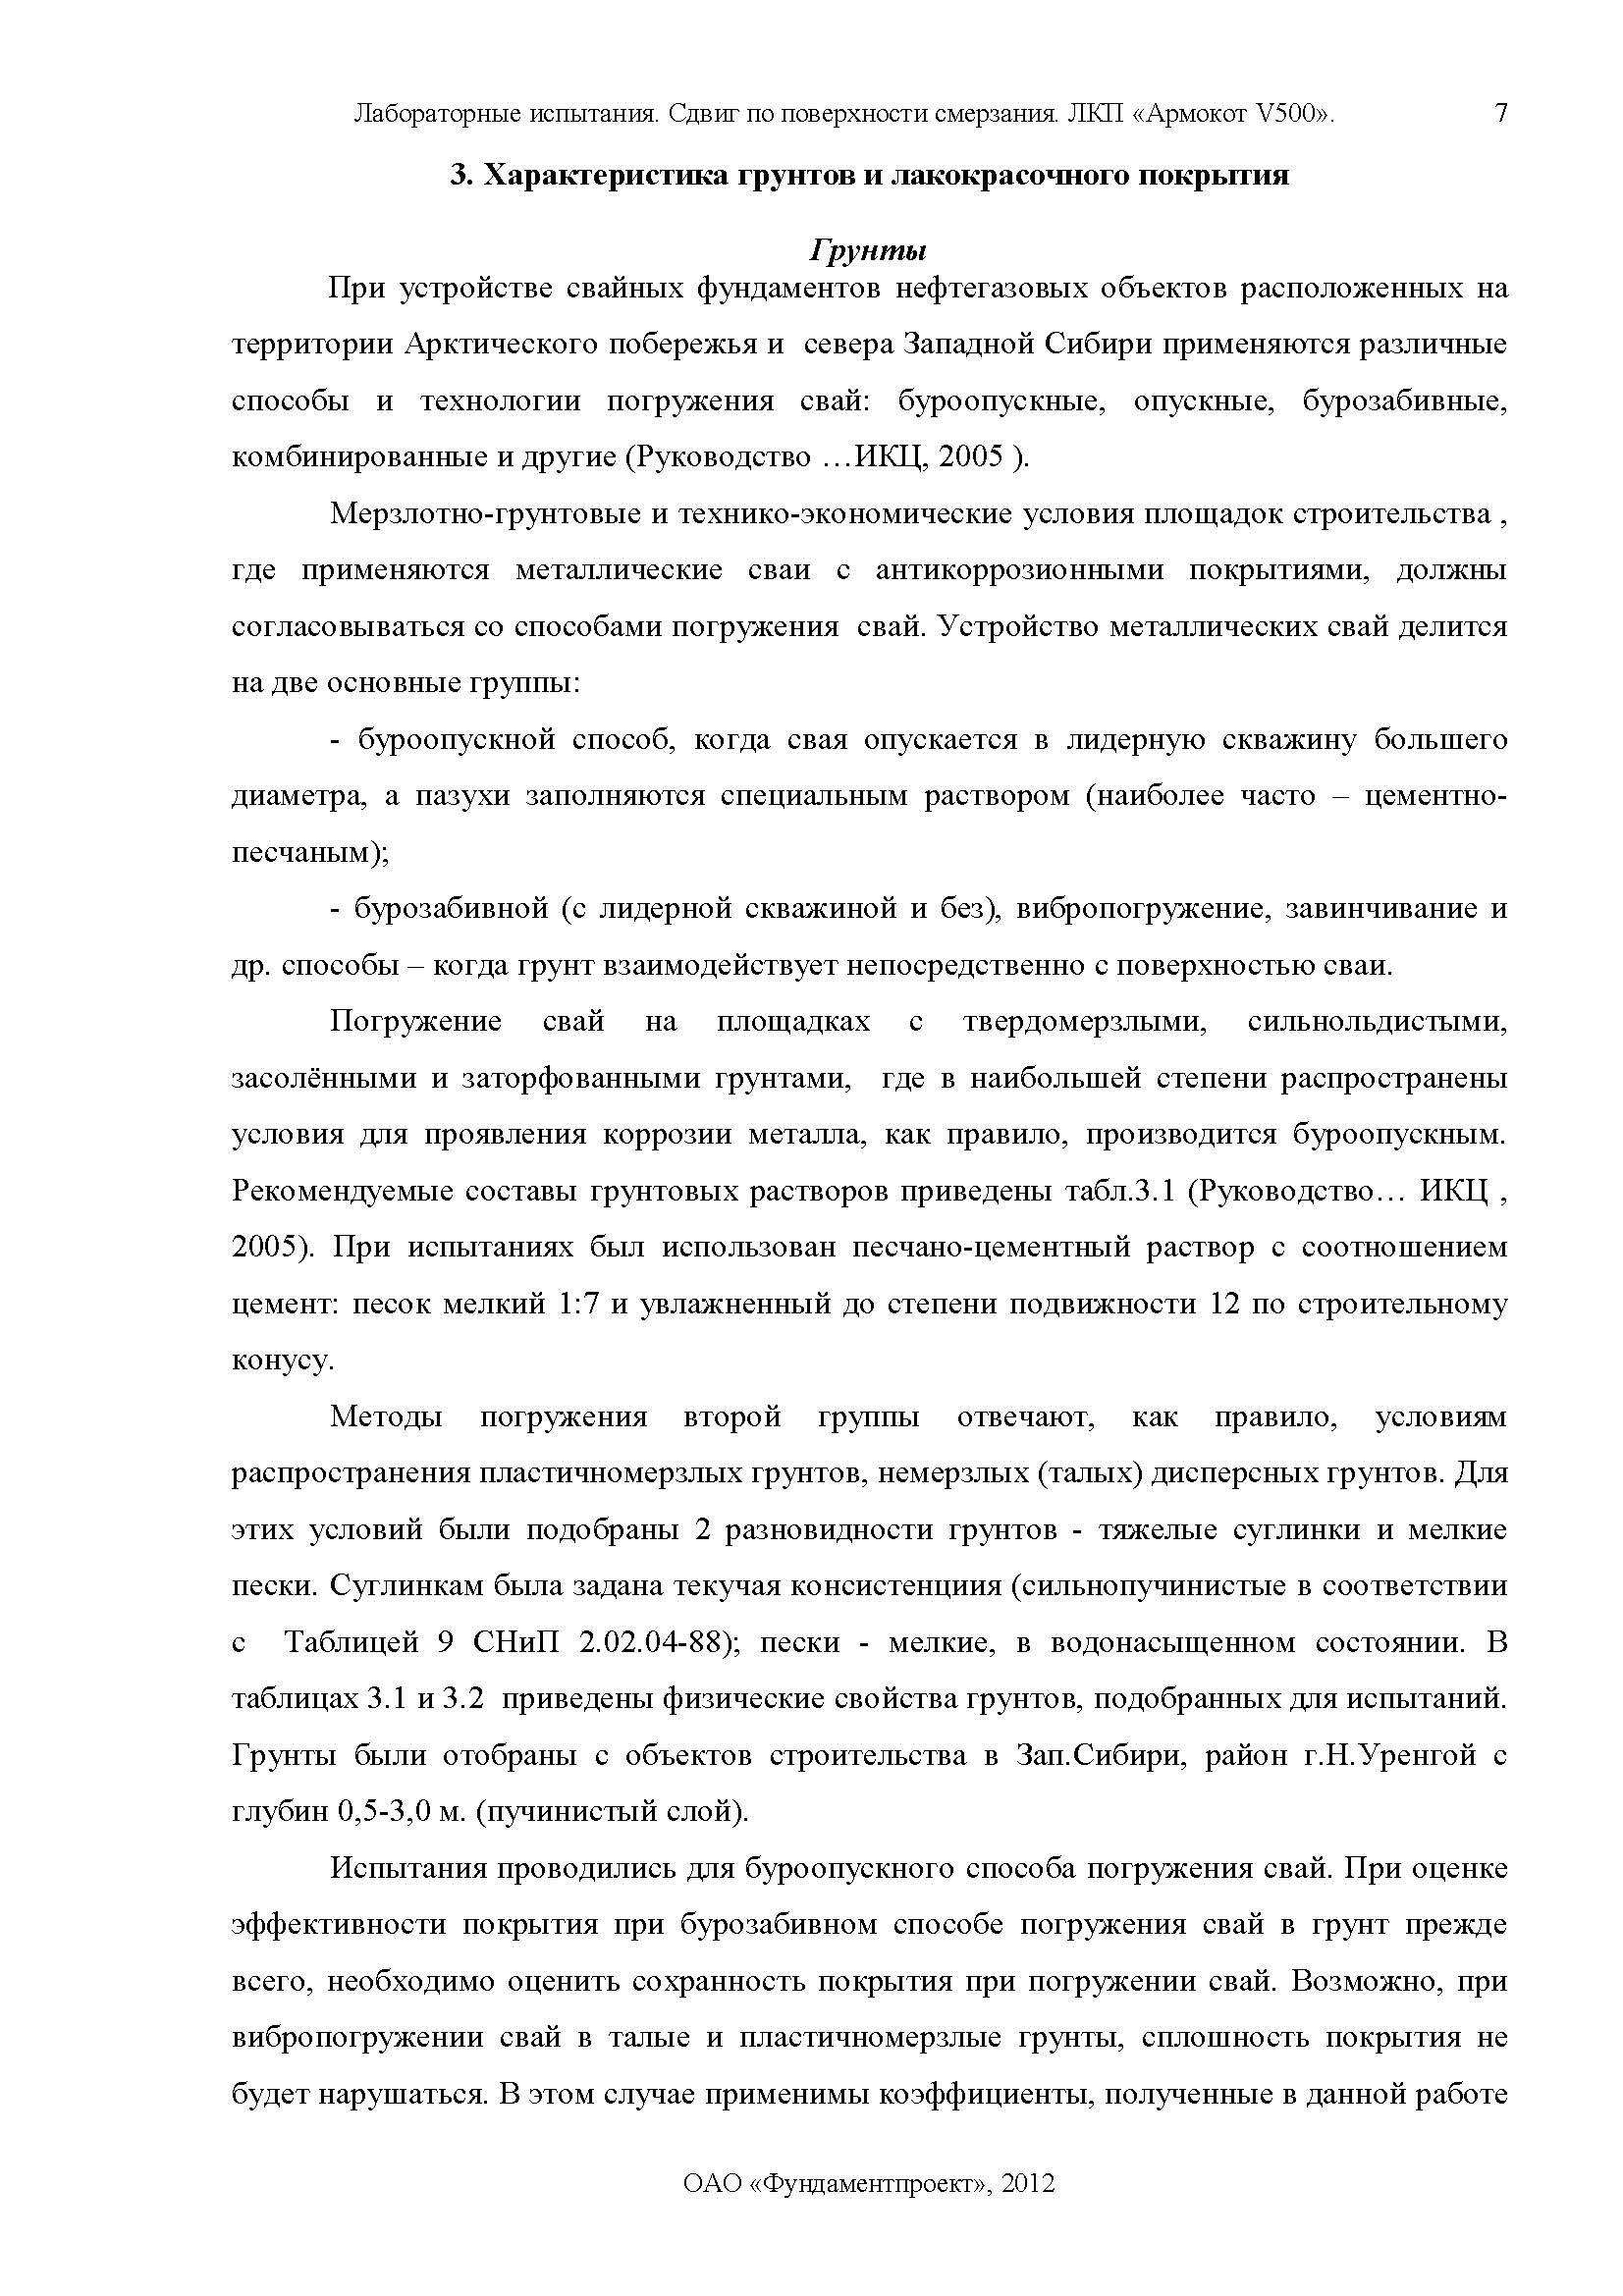 Отчет по сваям Армокот V500 Фундаментпроект_Страница_07